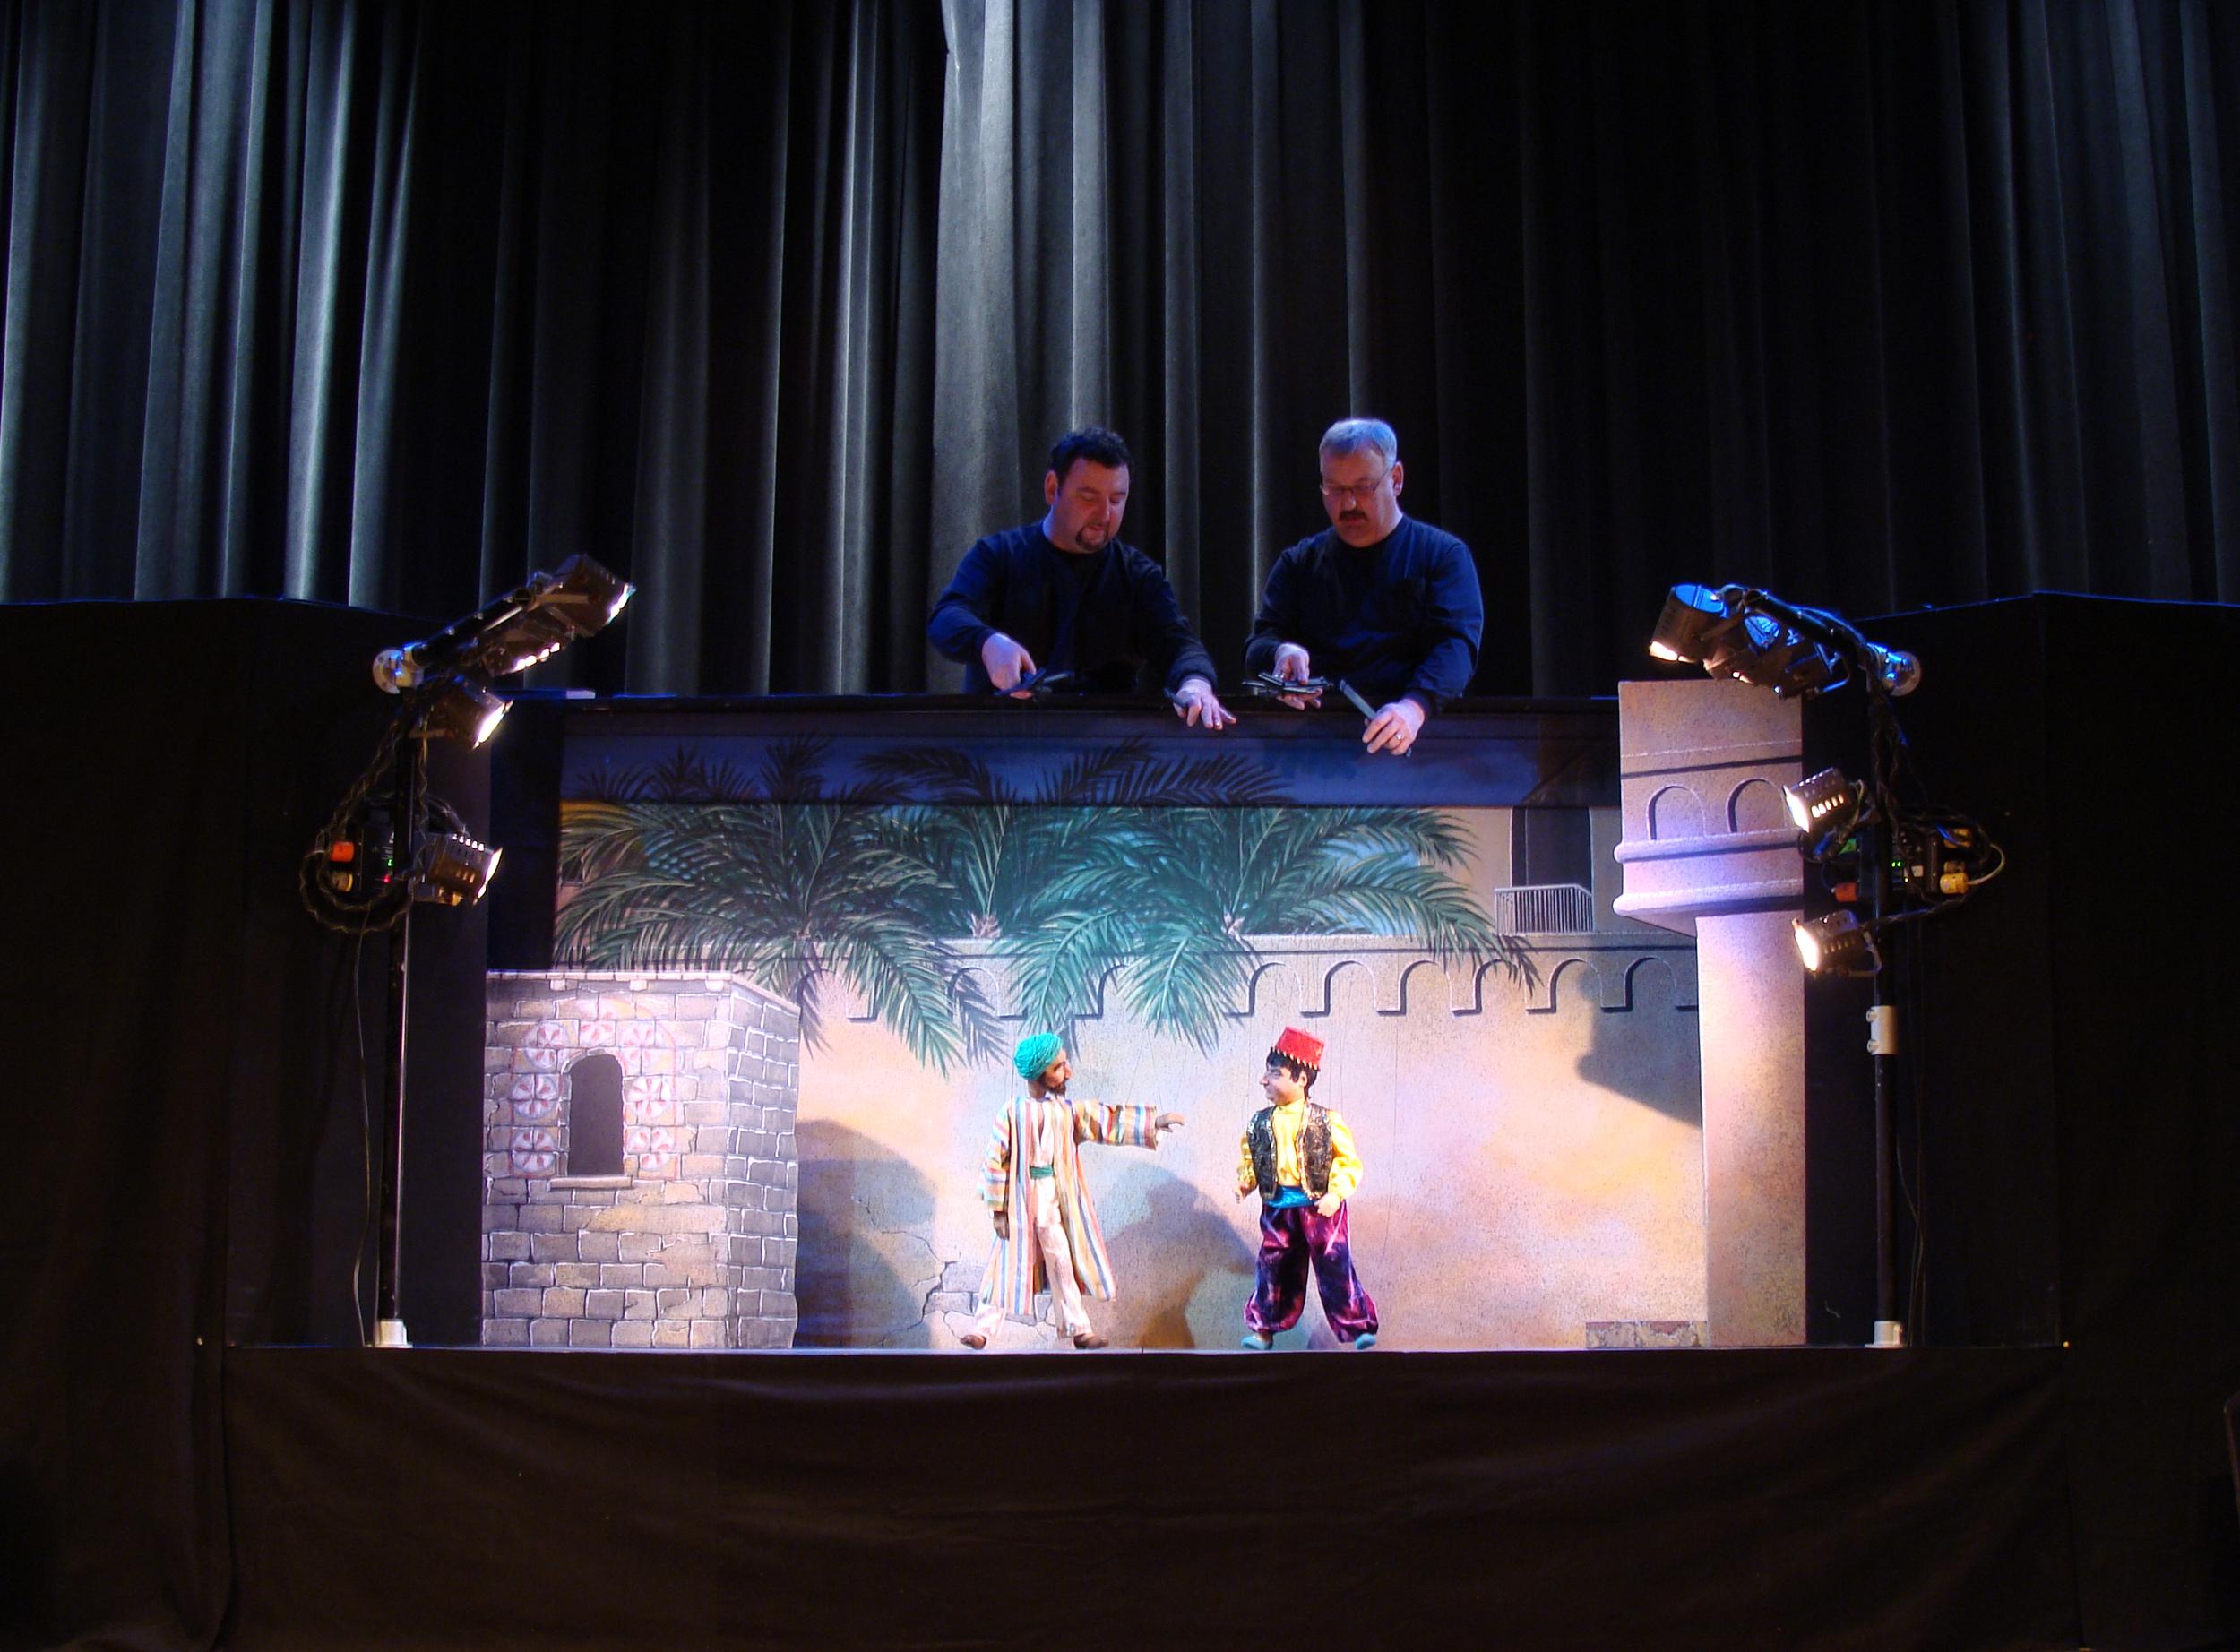 Arabian Nights. Left to right: Peter Syrotiak, David Syrotiak Jr.